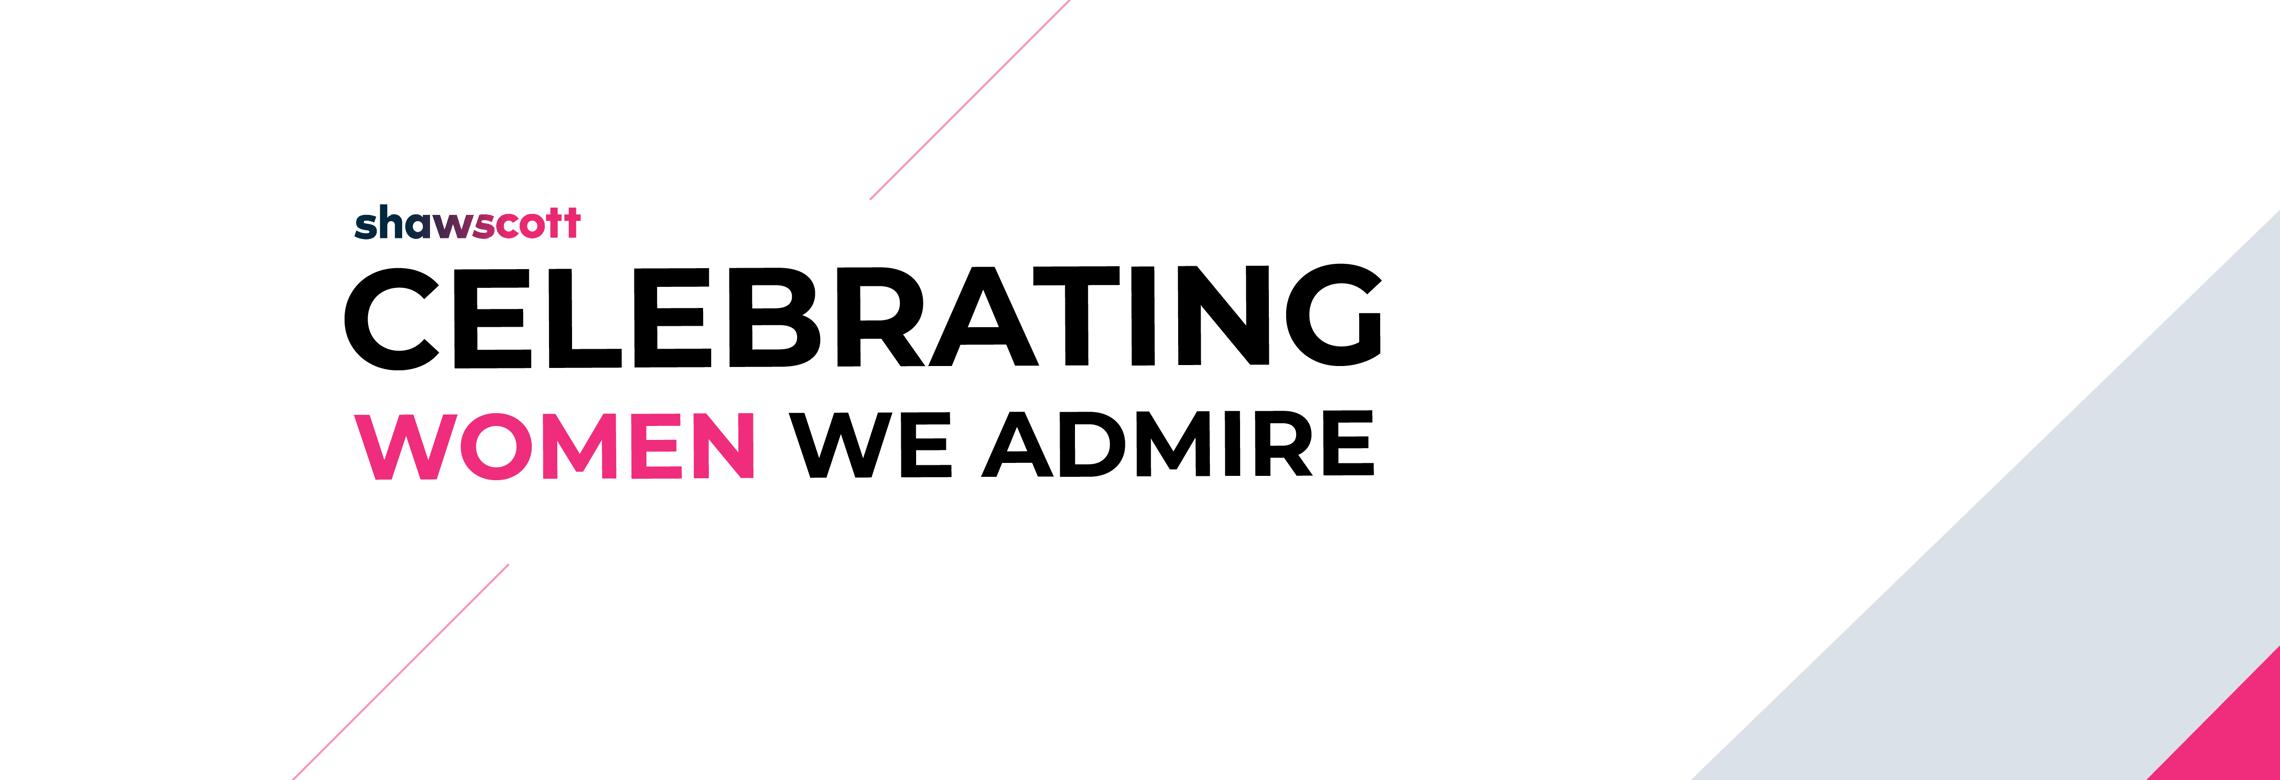 Shaw/Scott - Celebrating Women We Asdmire